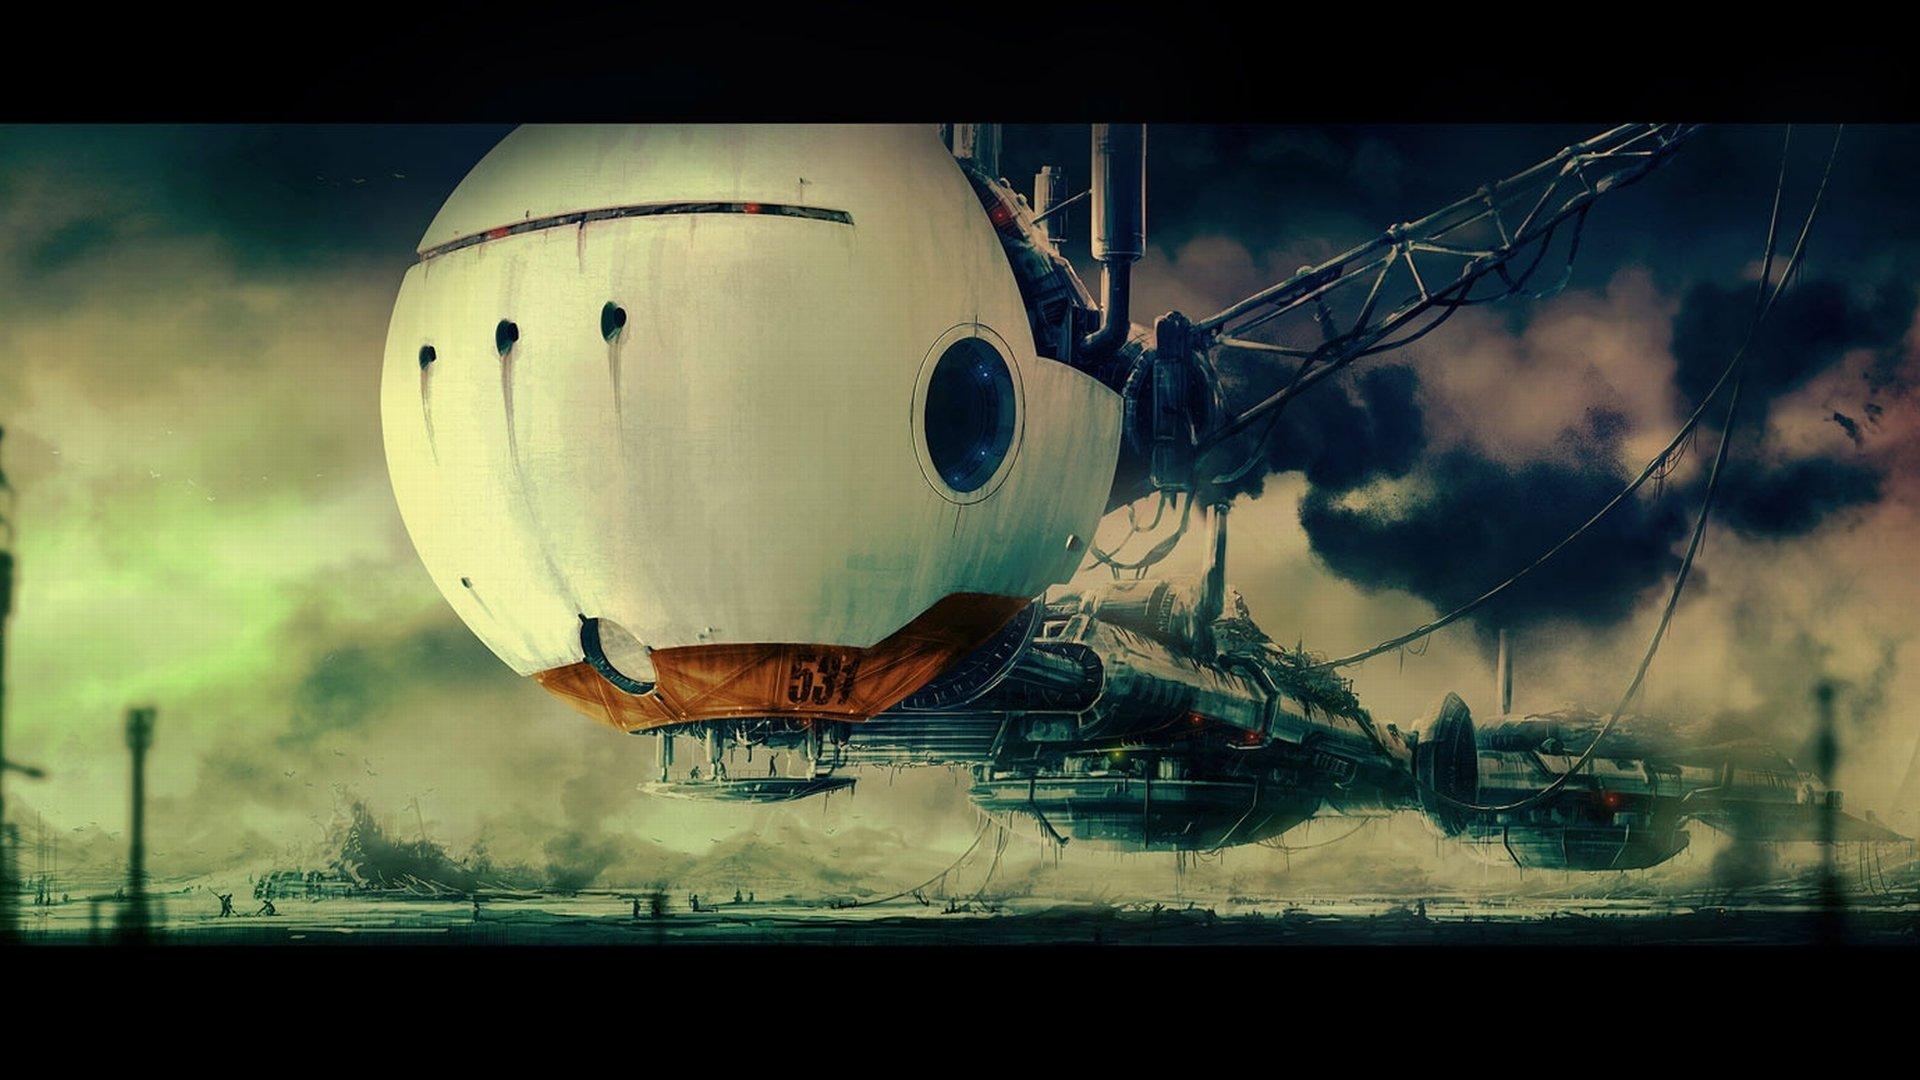 Sci Fi - Spaceship  Wallpaper